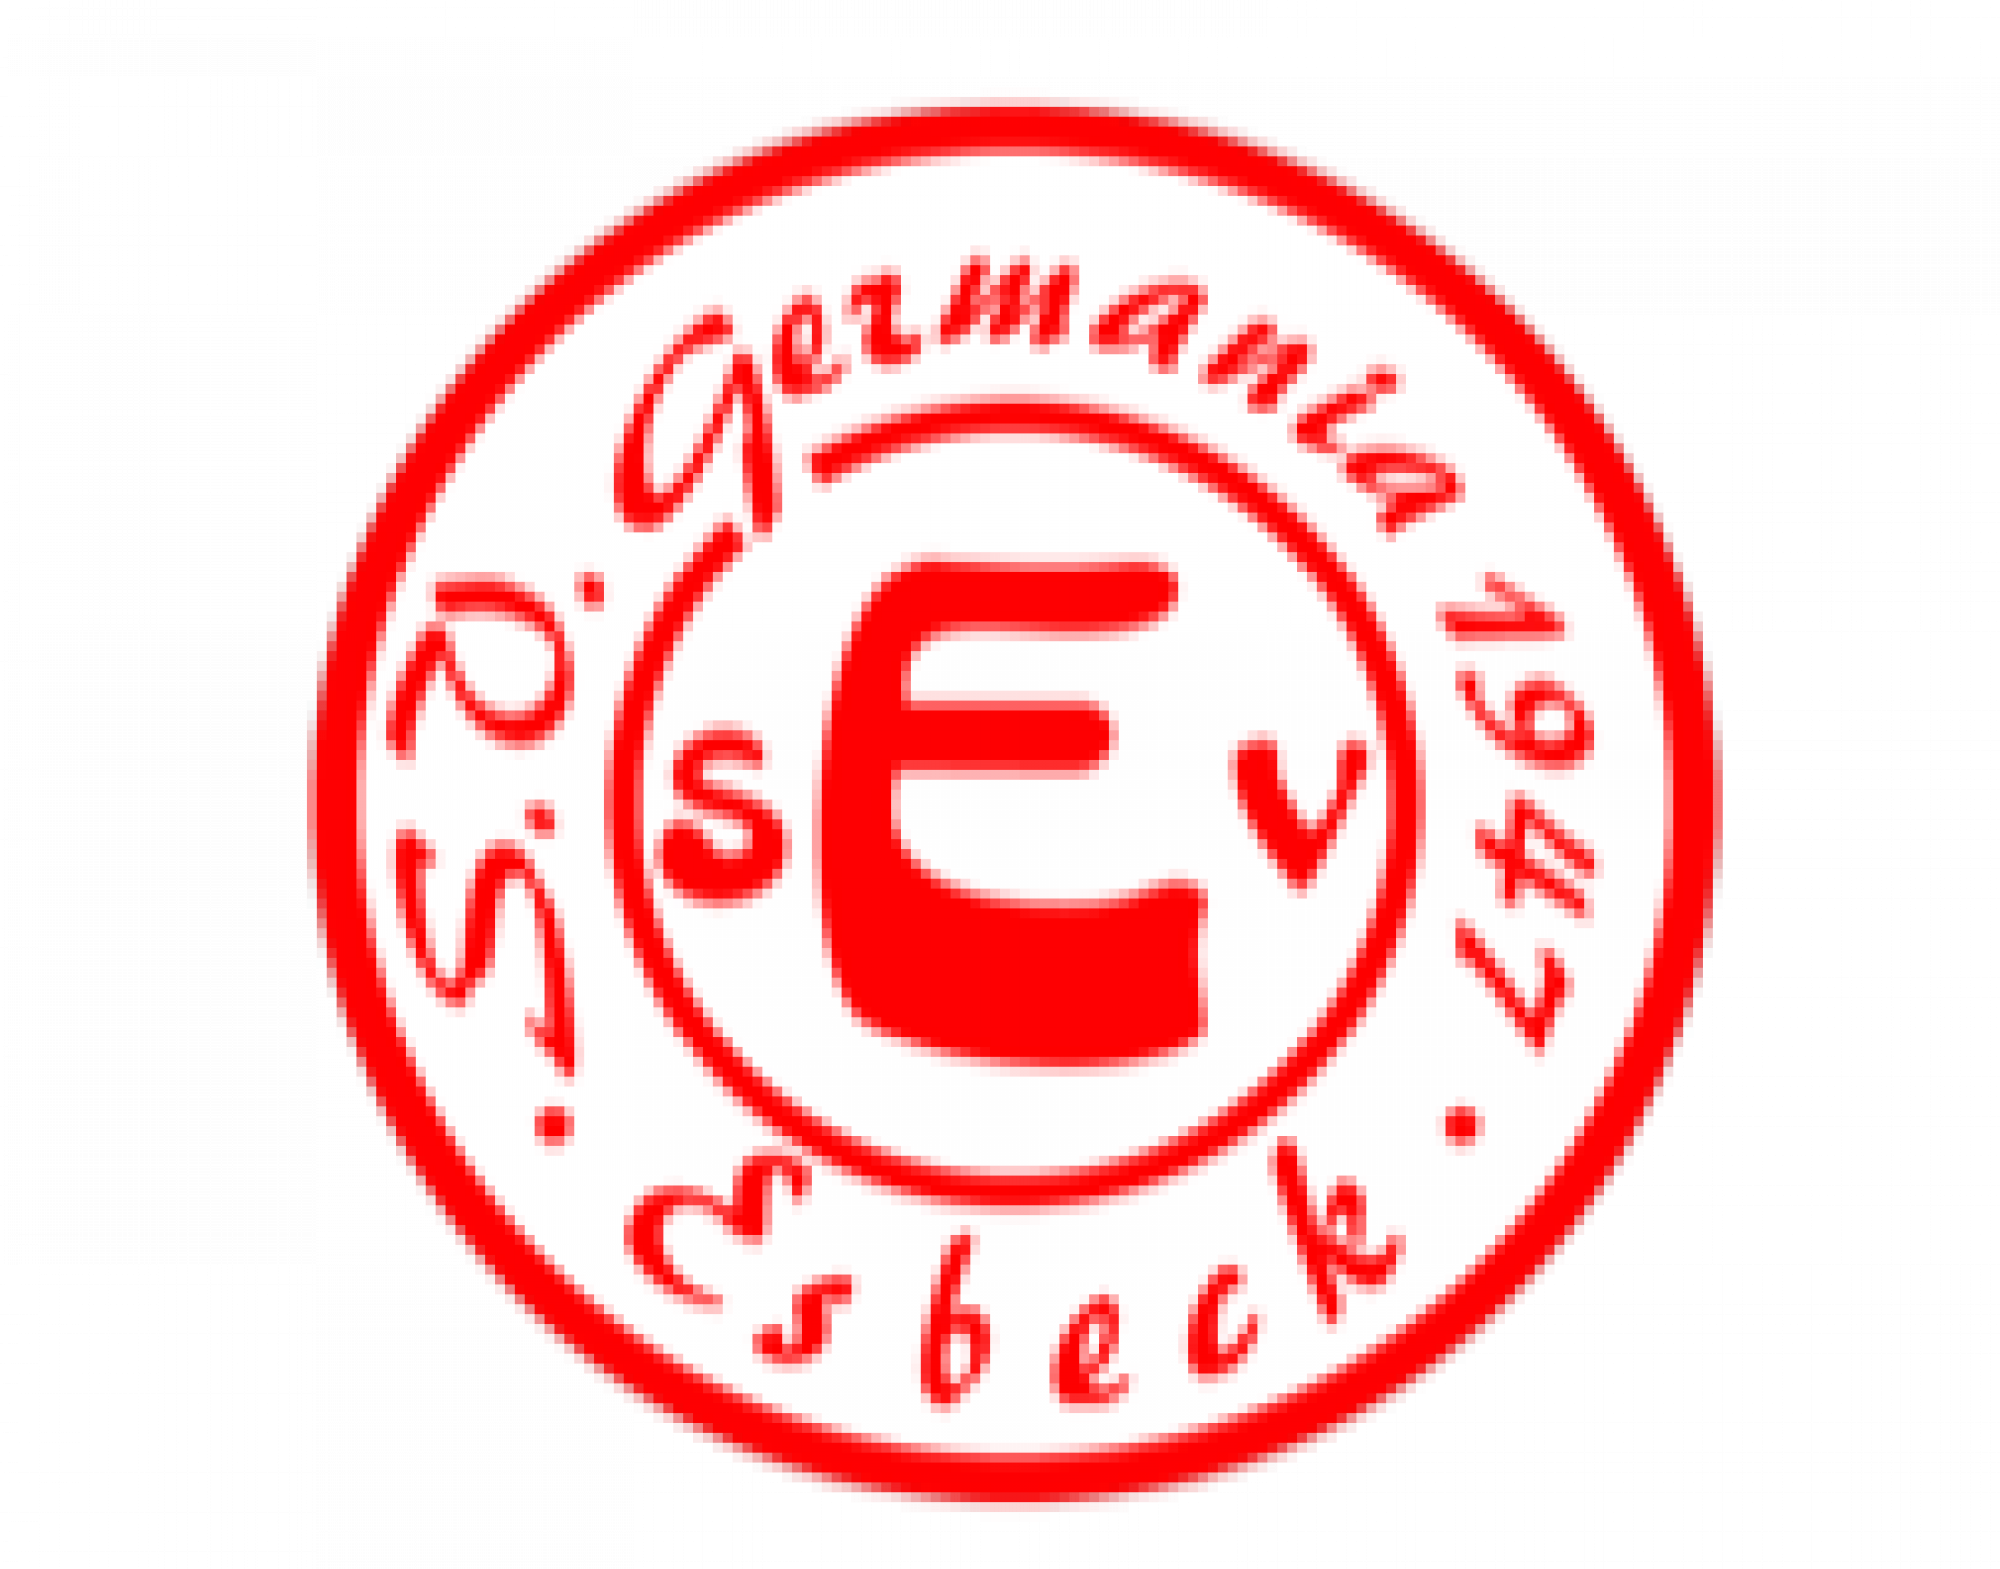 Germania Esbeck